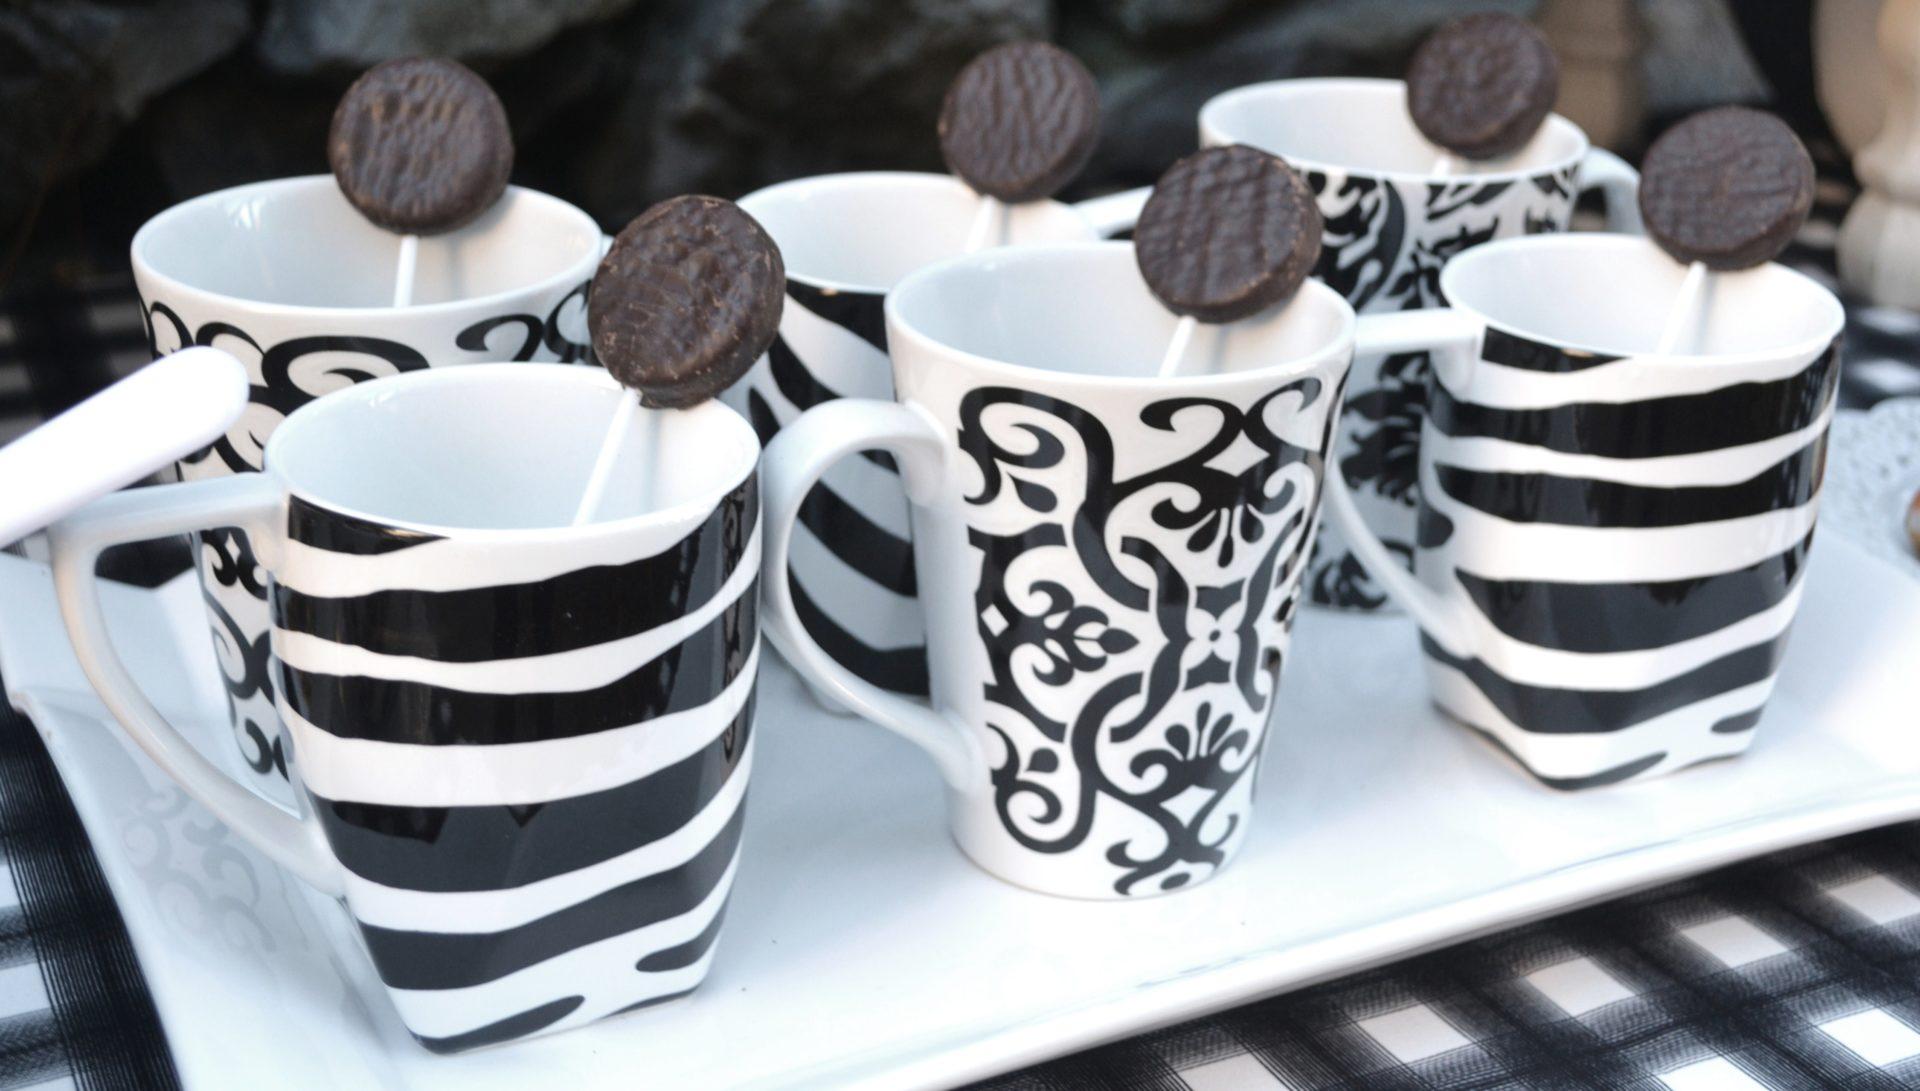 Hot Chocolate Bar Ideas - Liz Bushong